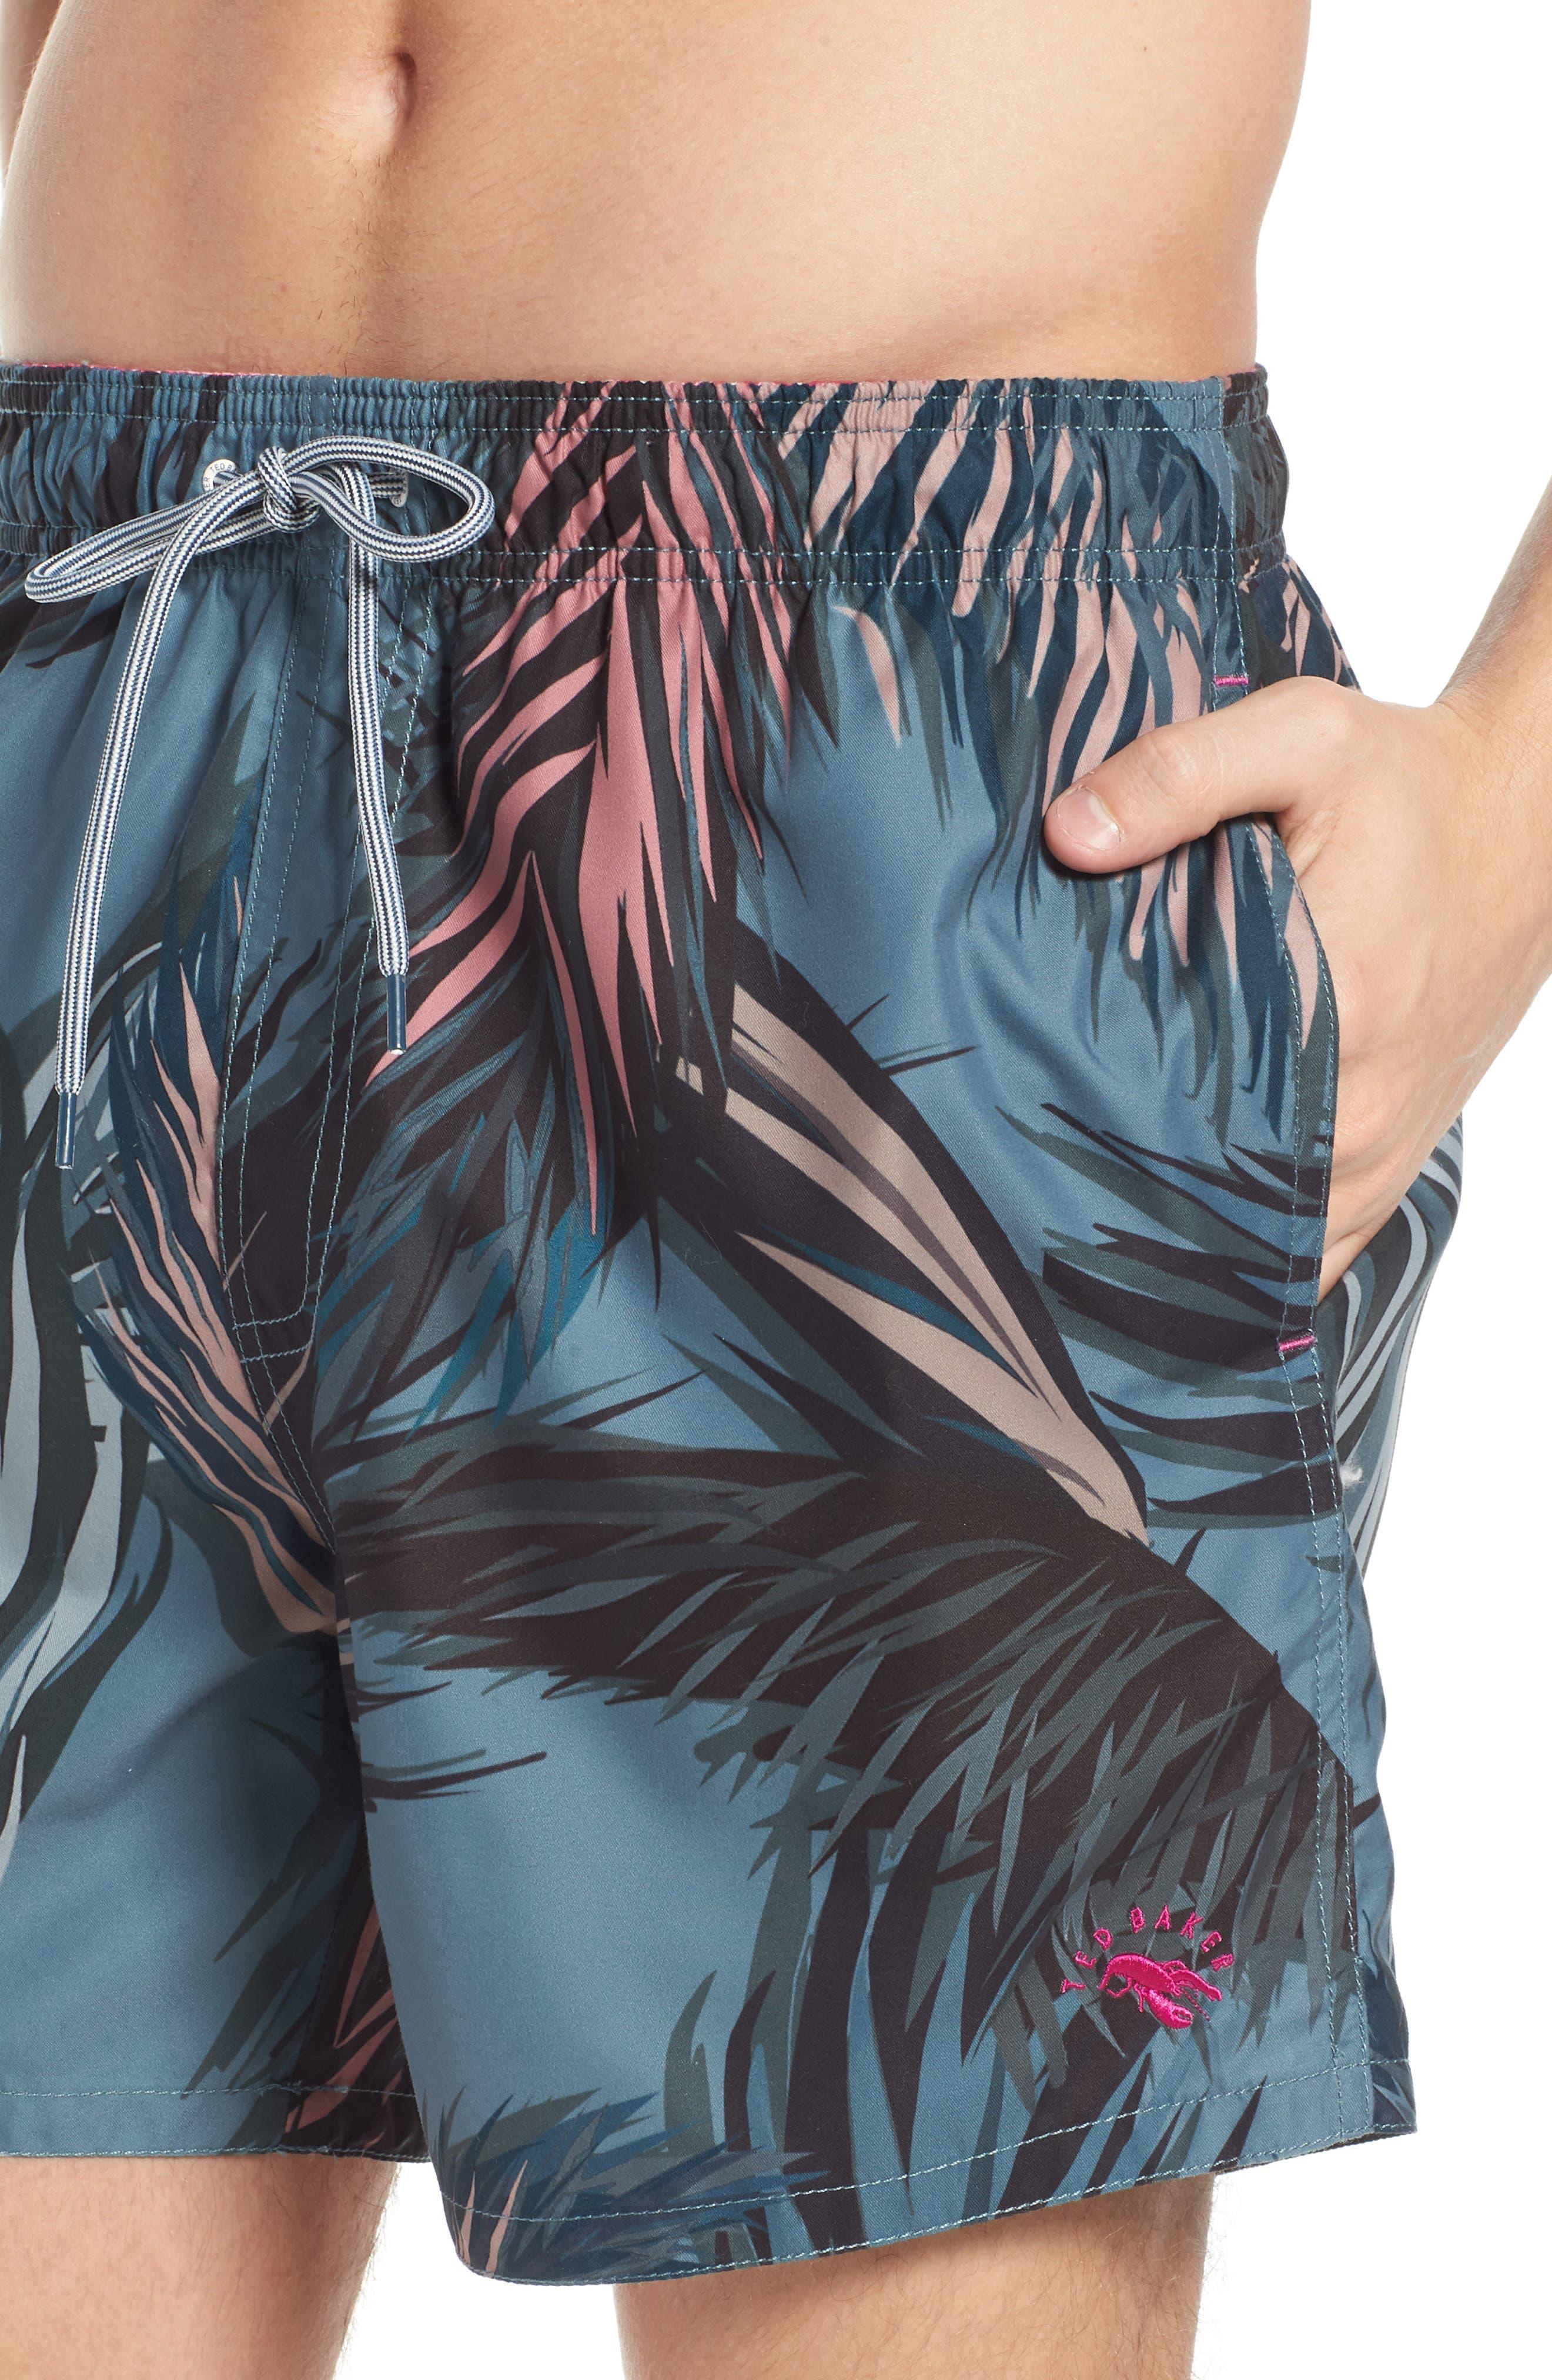 Raynebo Slim Fit Palm Leaf Swim Trunks,                             Alternate thumbnail 4, color,                             301